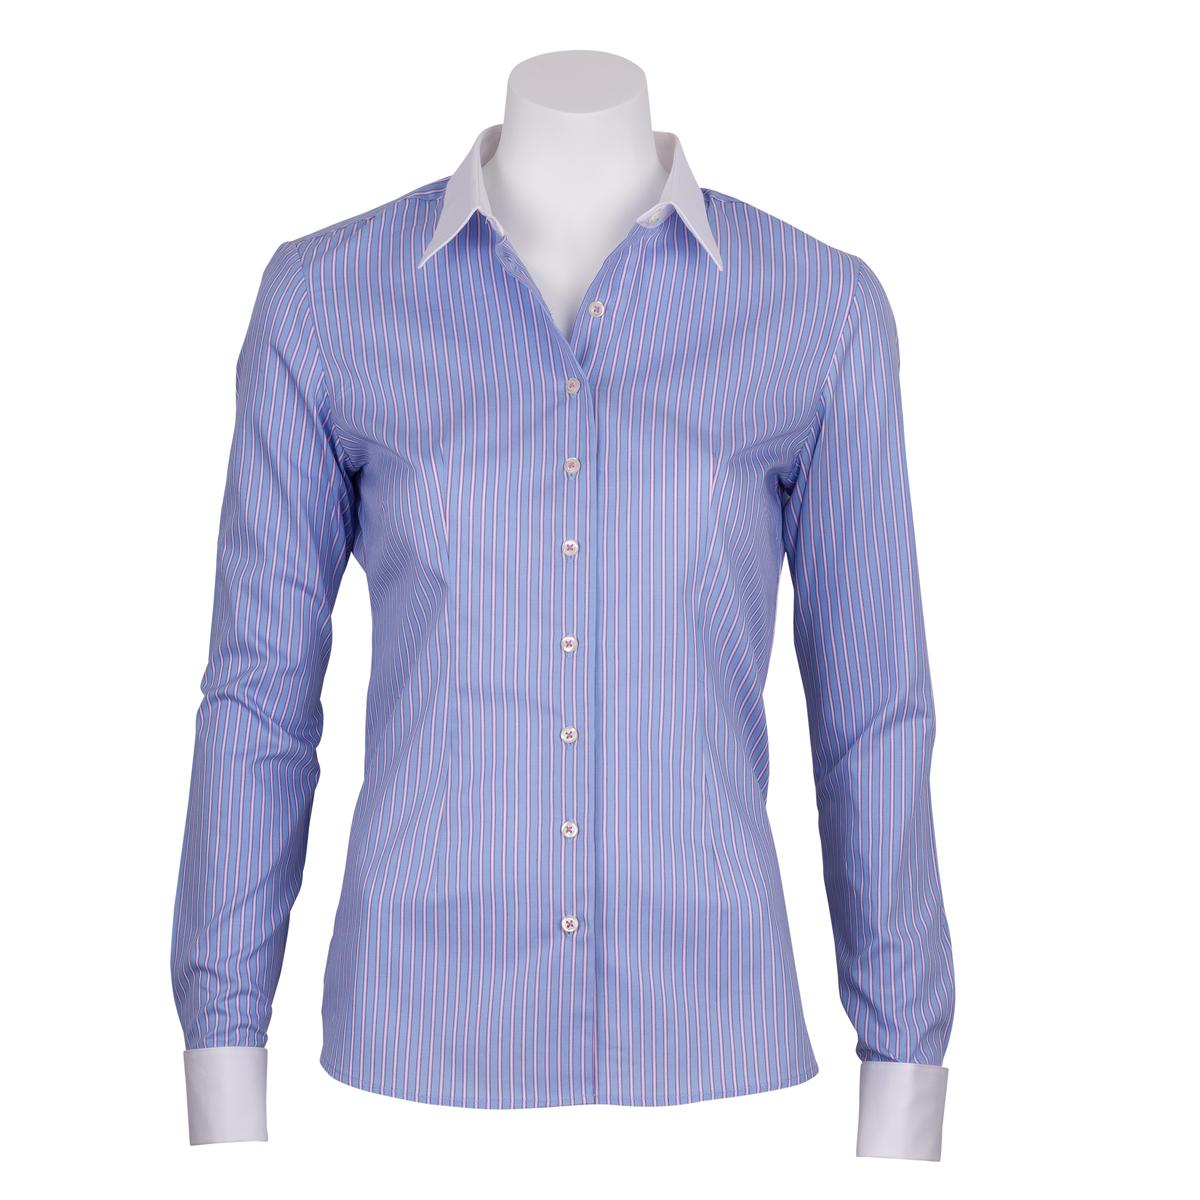 Ladies Shirt-Ecommerce Picture